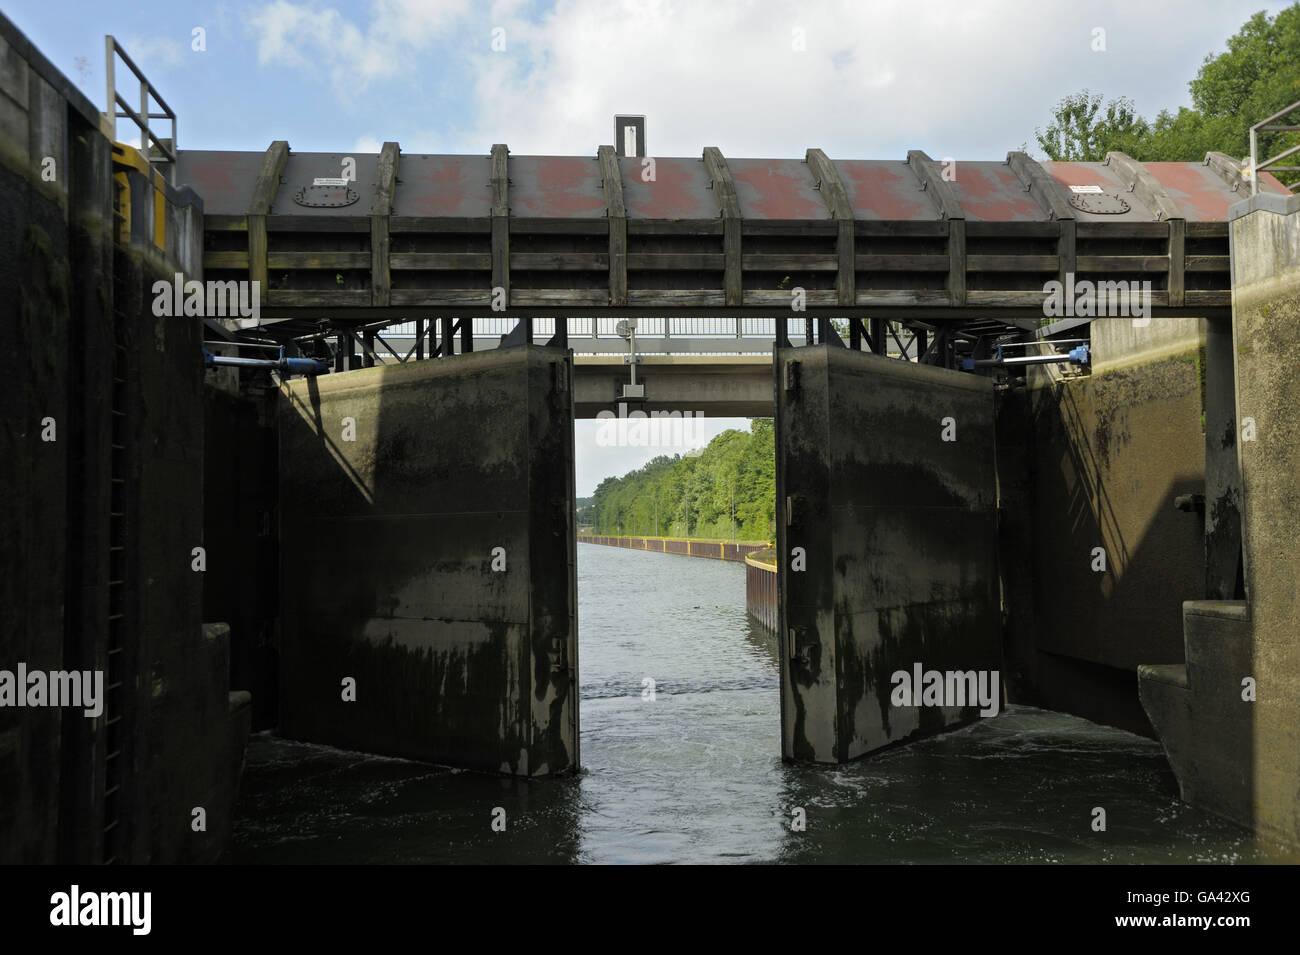 Floodgate Gelsenkirchen, Rhine-Herne-canal, Gelsenkirchen, North Rhine-Westphalia, Germany - Stock Image